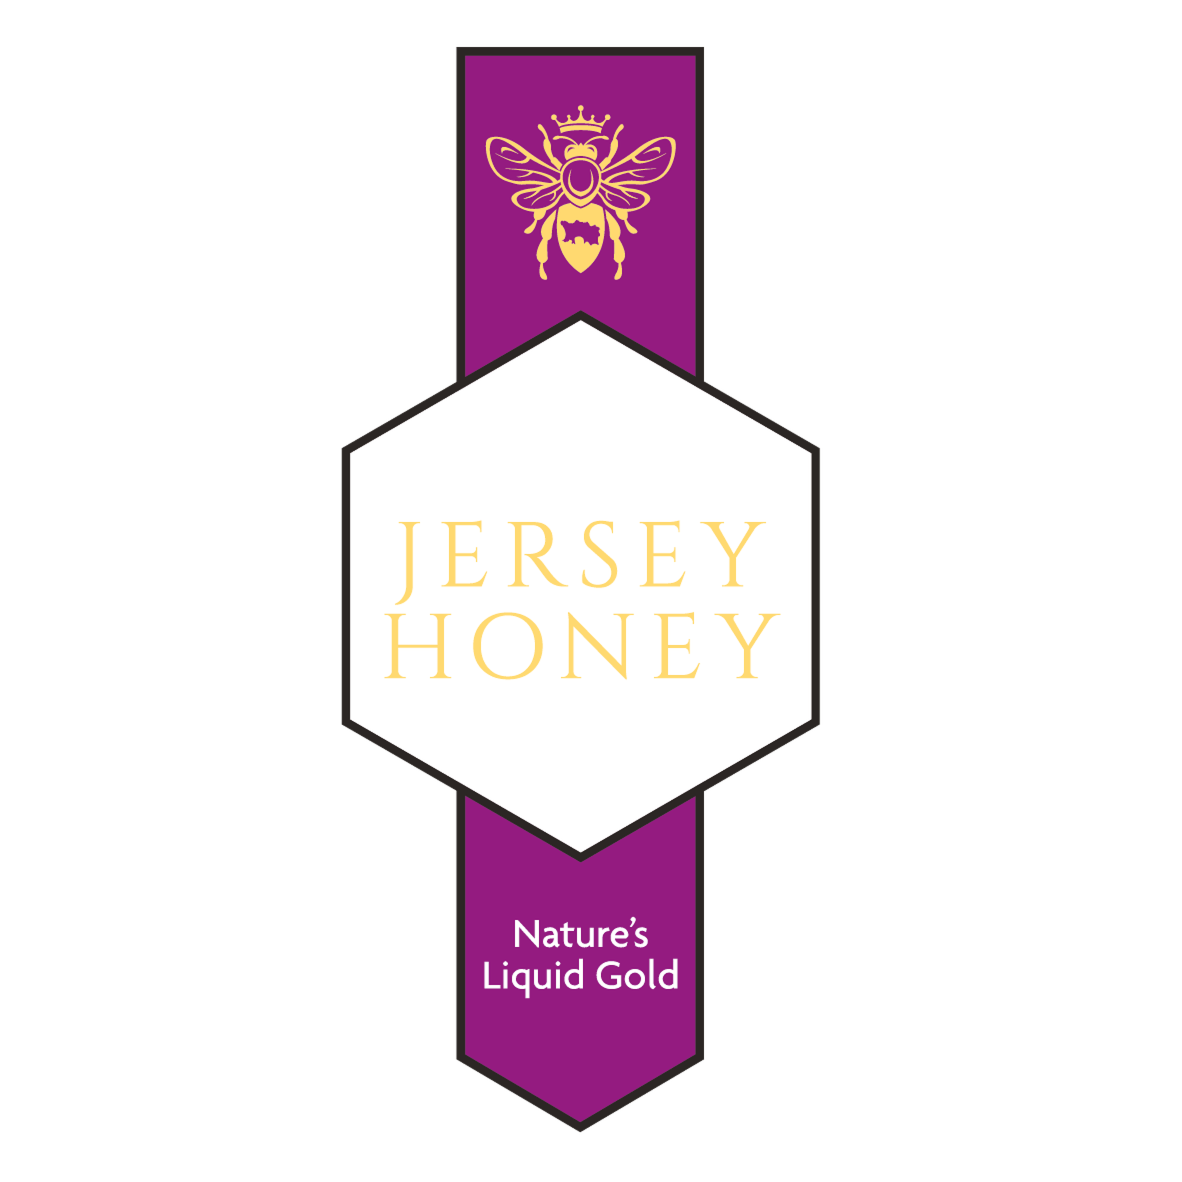 Jersey Honey